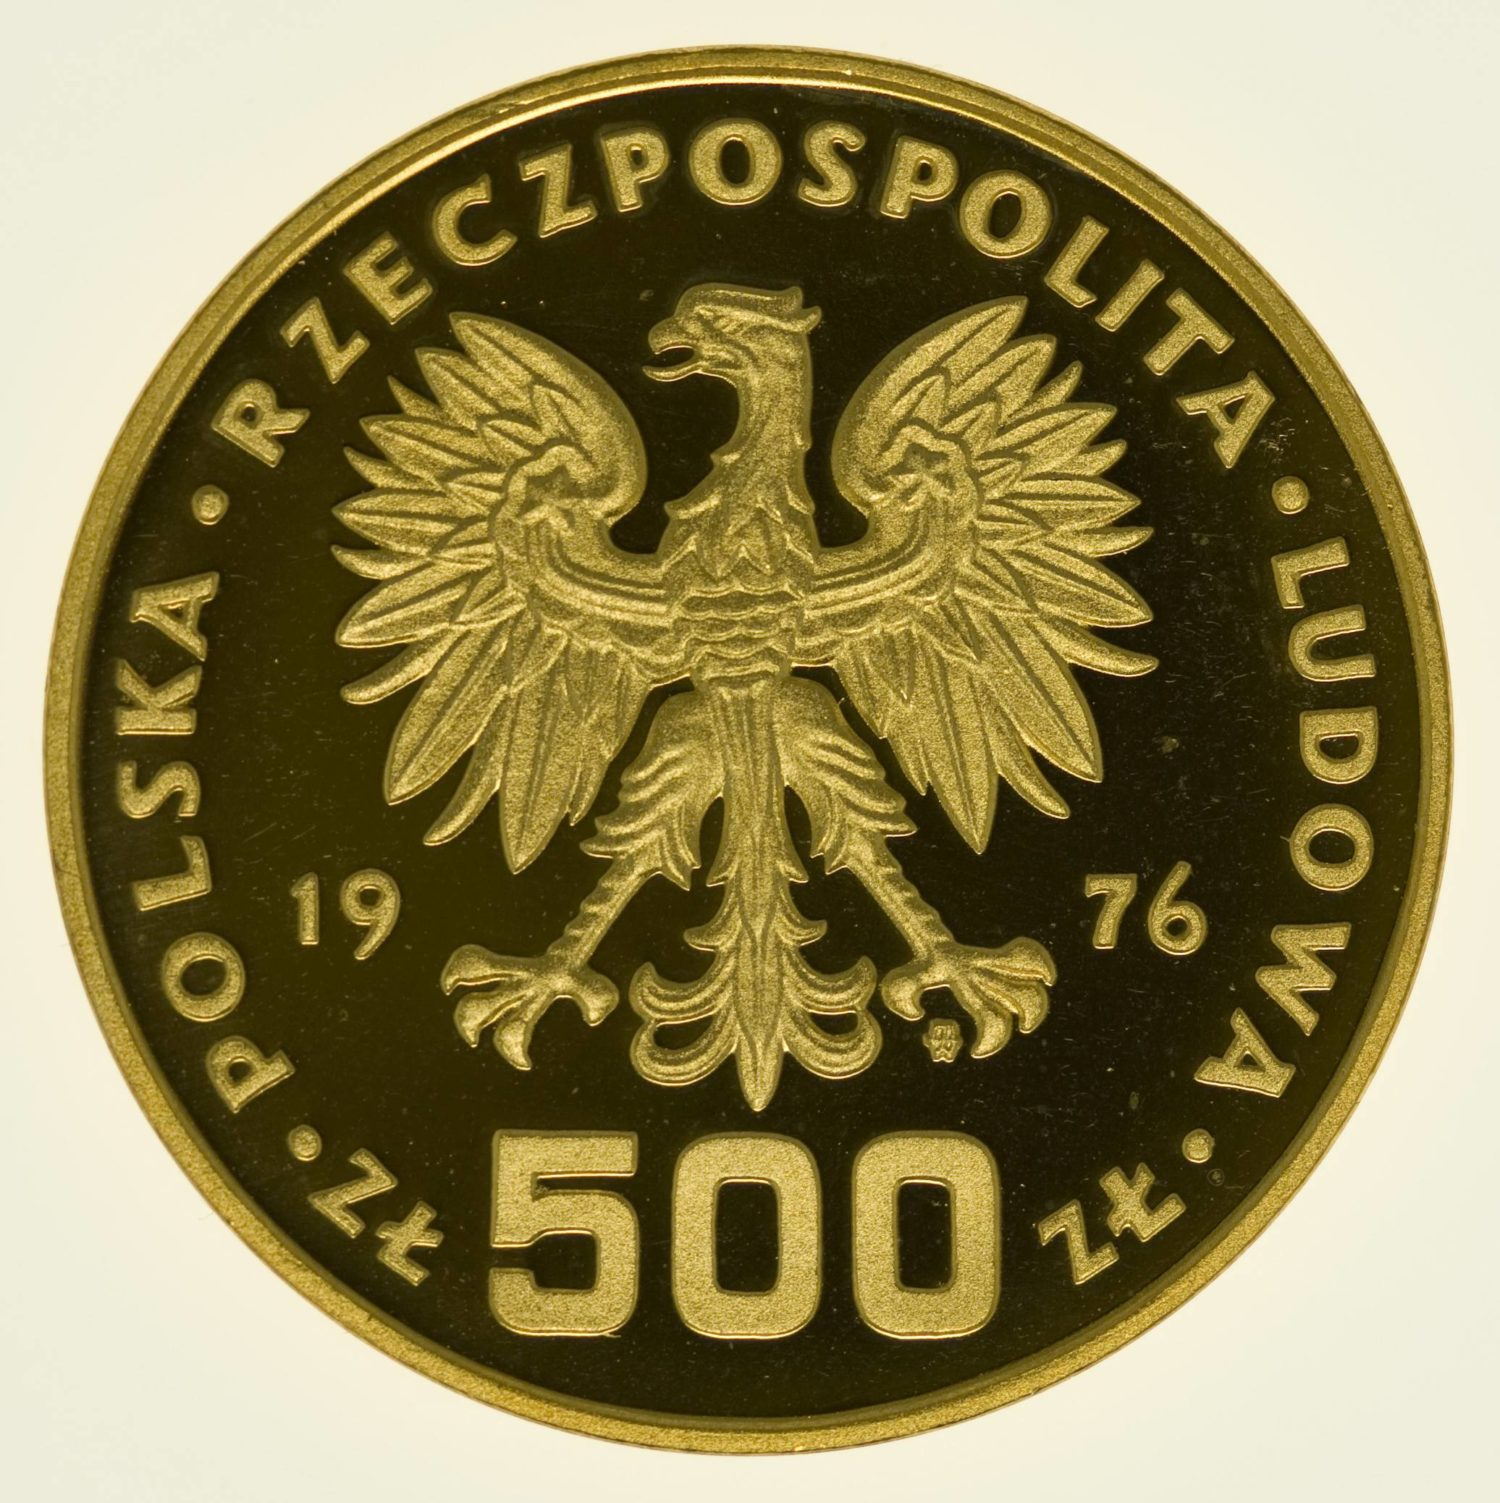 Polen Kosciuszko 500 Zloty 1976 PP Gold 26,96 Gramm fein RAR